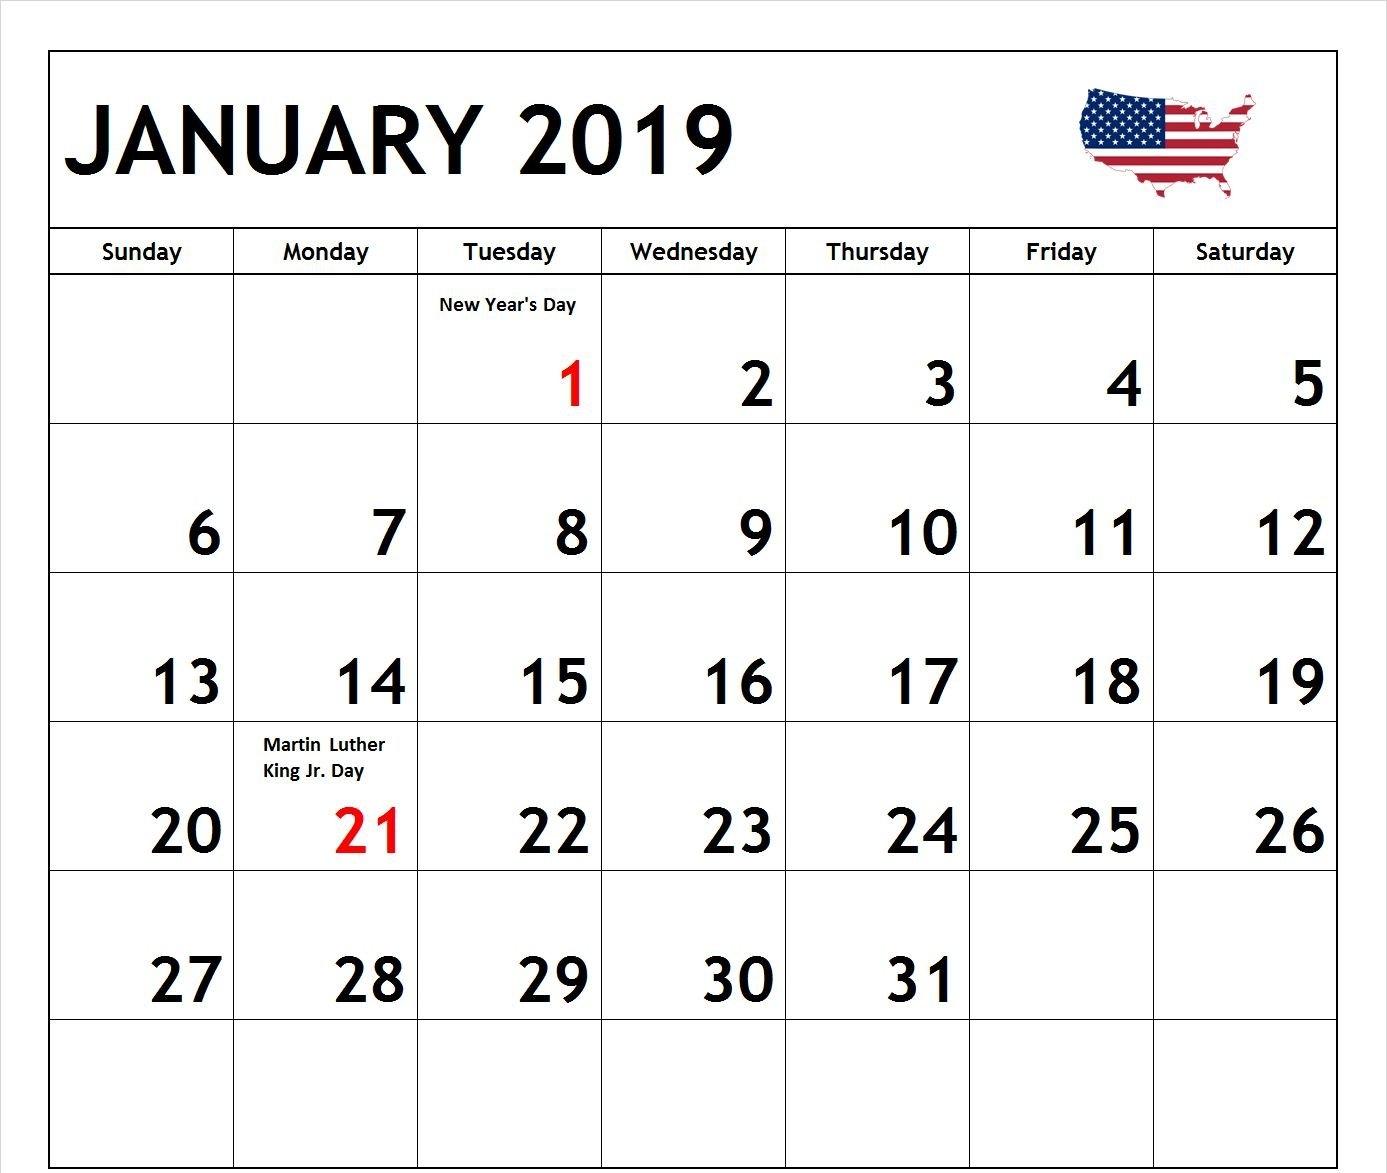 ✅ January 2019 Calendar With Holidays Us, Canada, Uk, Australia Calendar 2019 Including Holidays